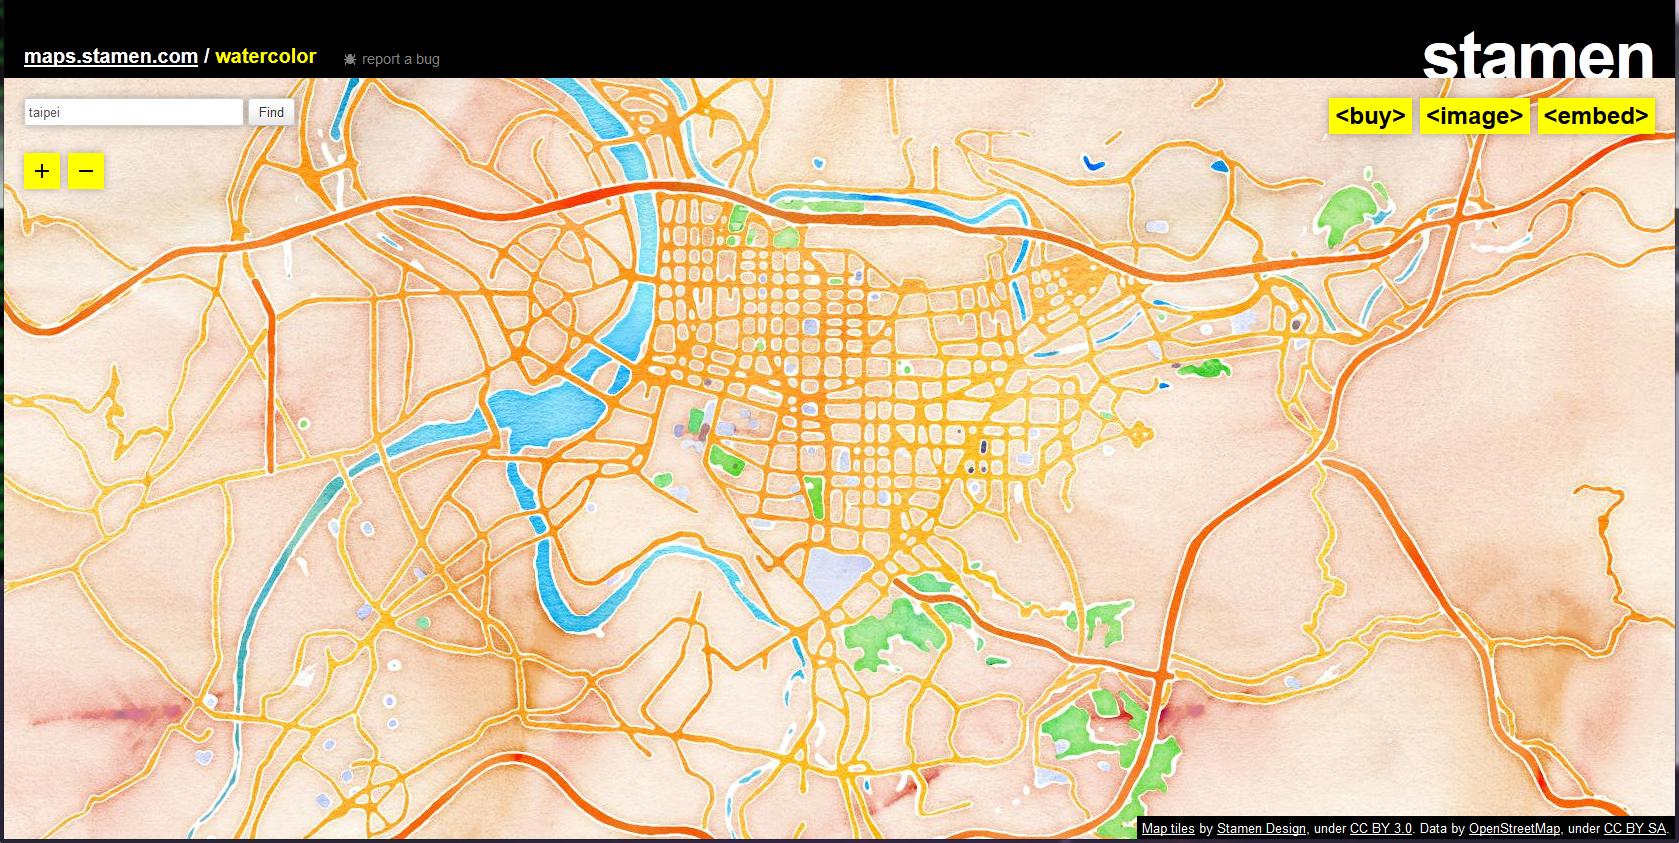 maps.stamen